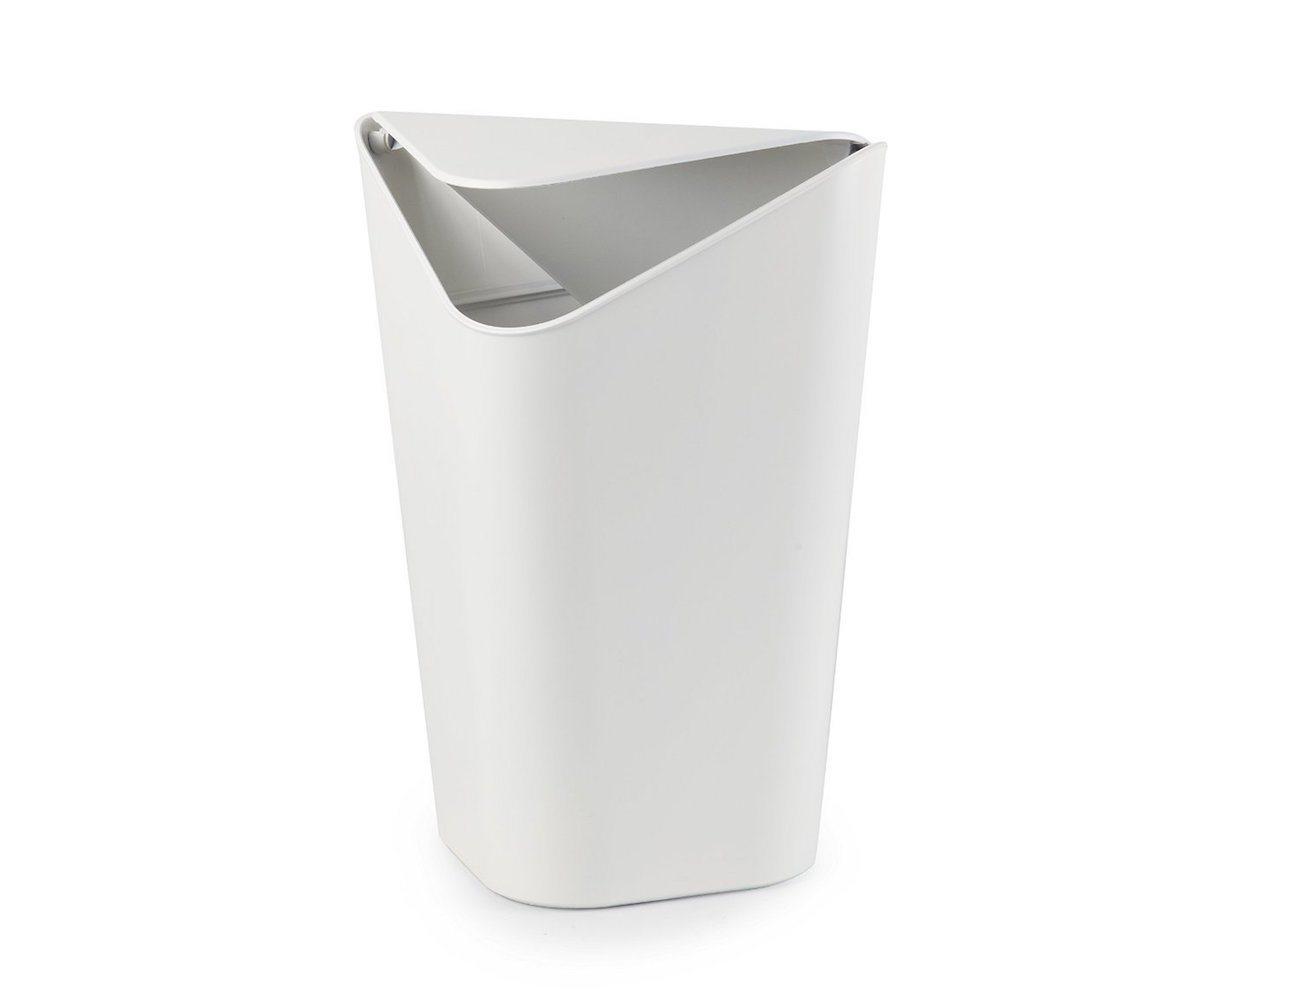 Corner waste bin perfect waste bin for corners gadget flow - Corner wastebasket ...